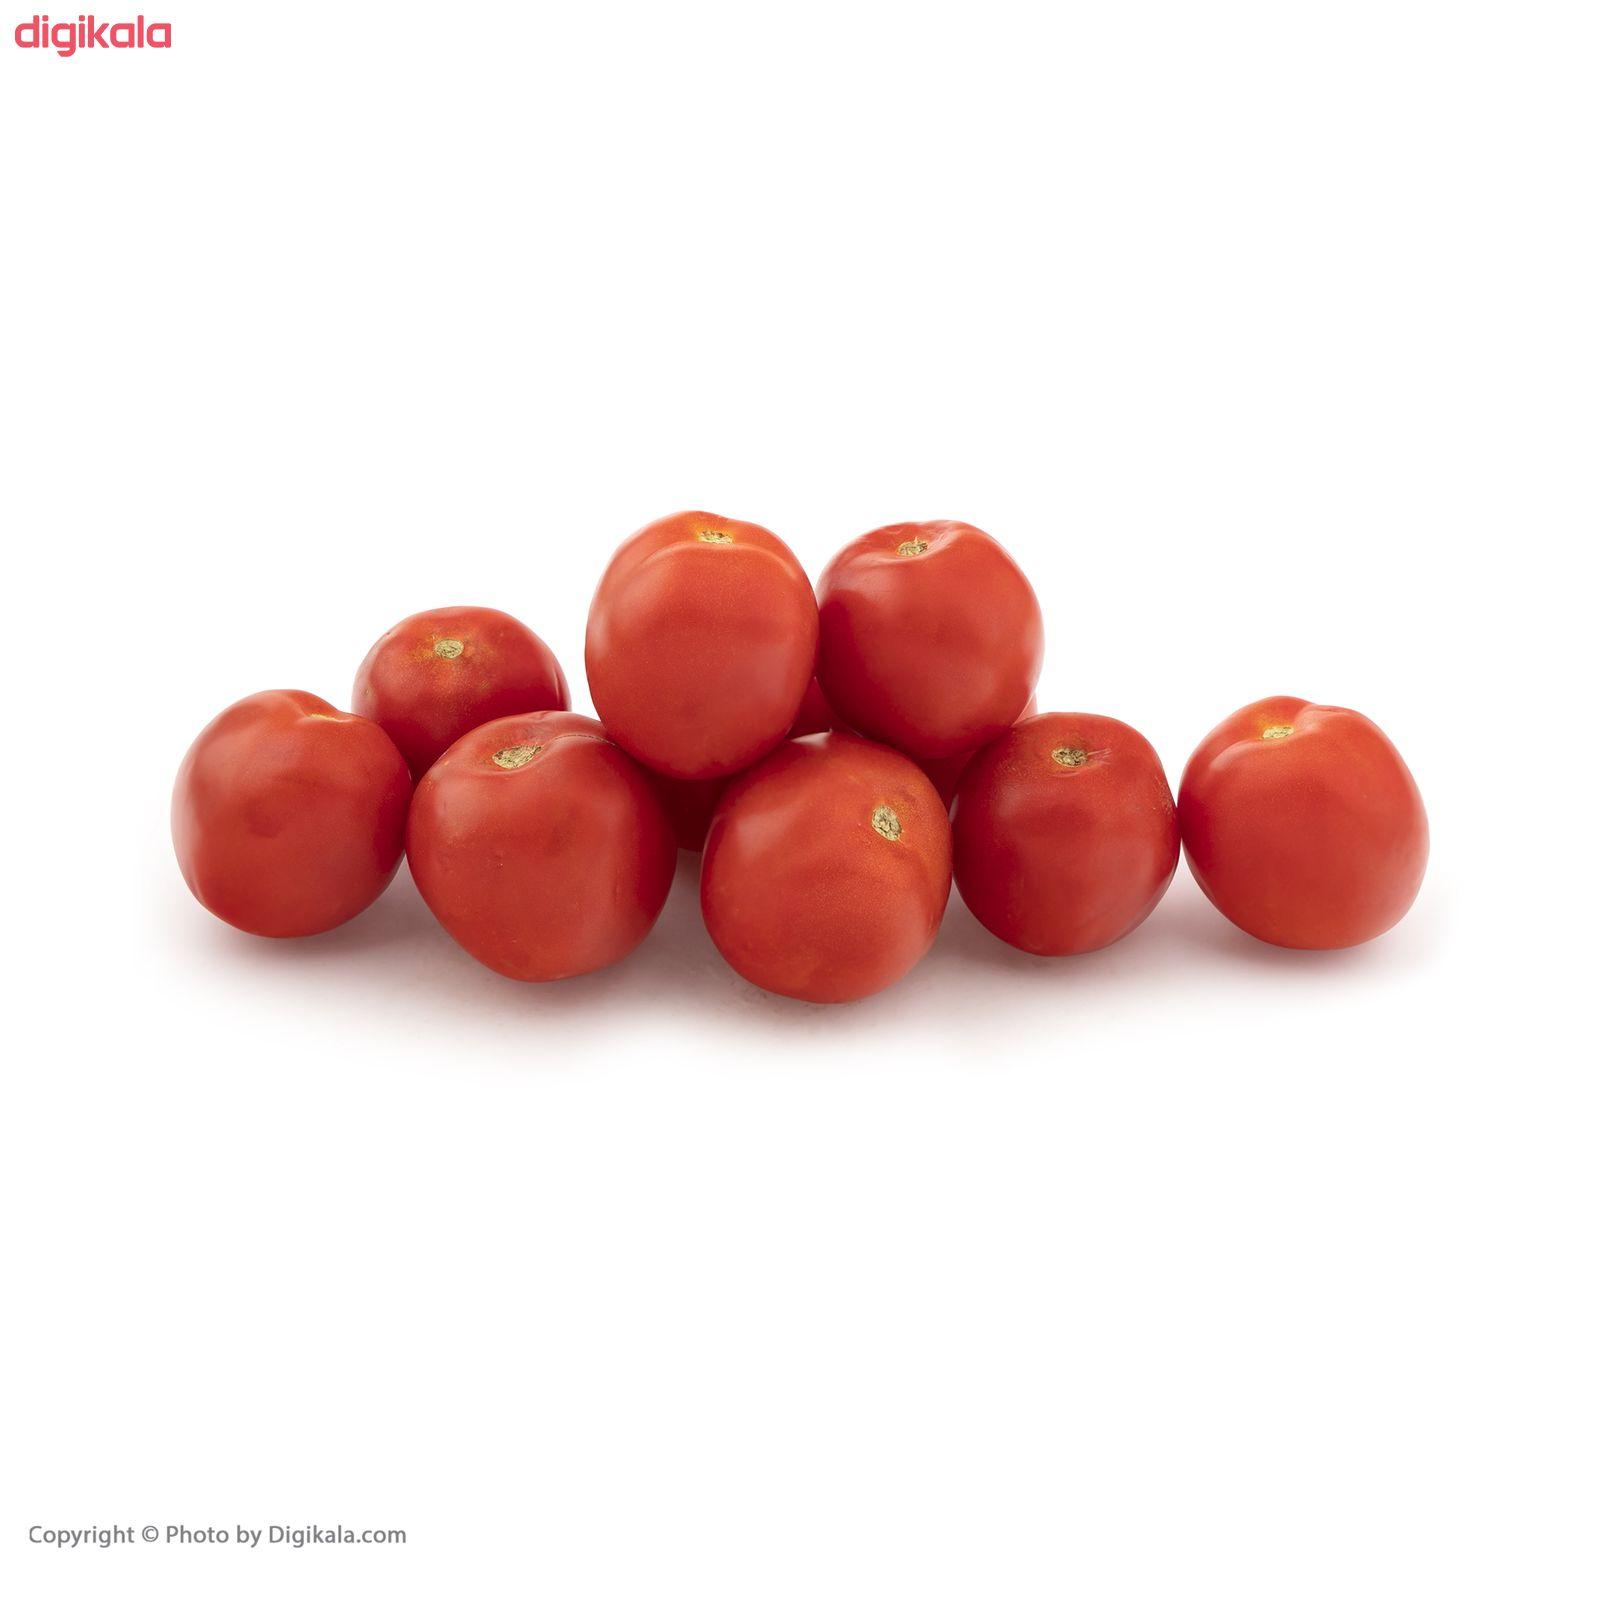 گوجه فرنگی بوته ای میوه پلاس - 1 کیلوگرم main 1 3